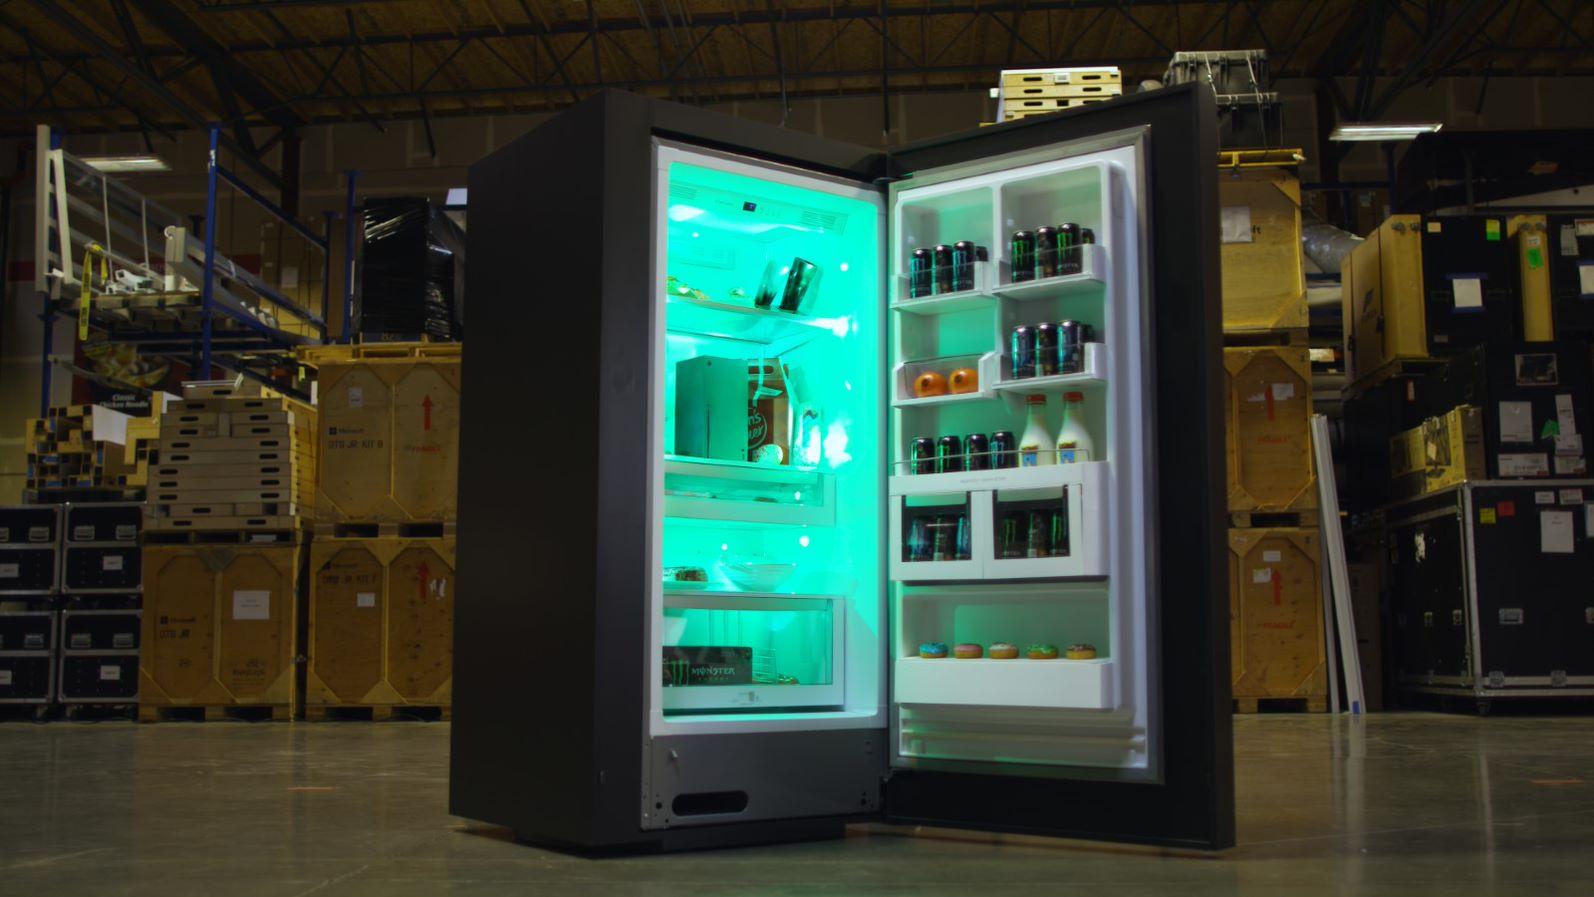 Your meme is a dream: Xbox made the Xbox Series X fridge screenshot